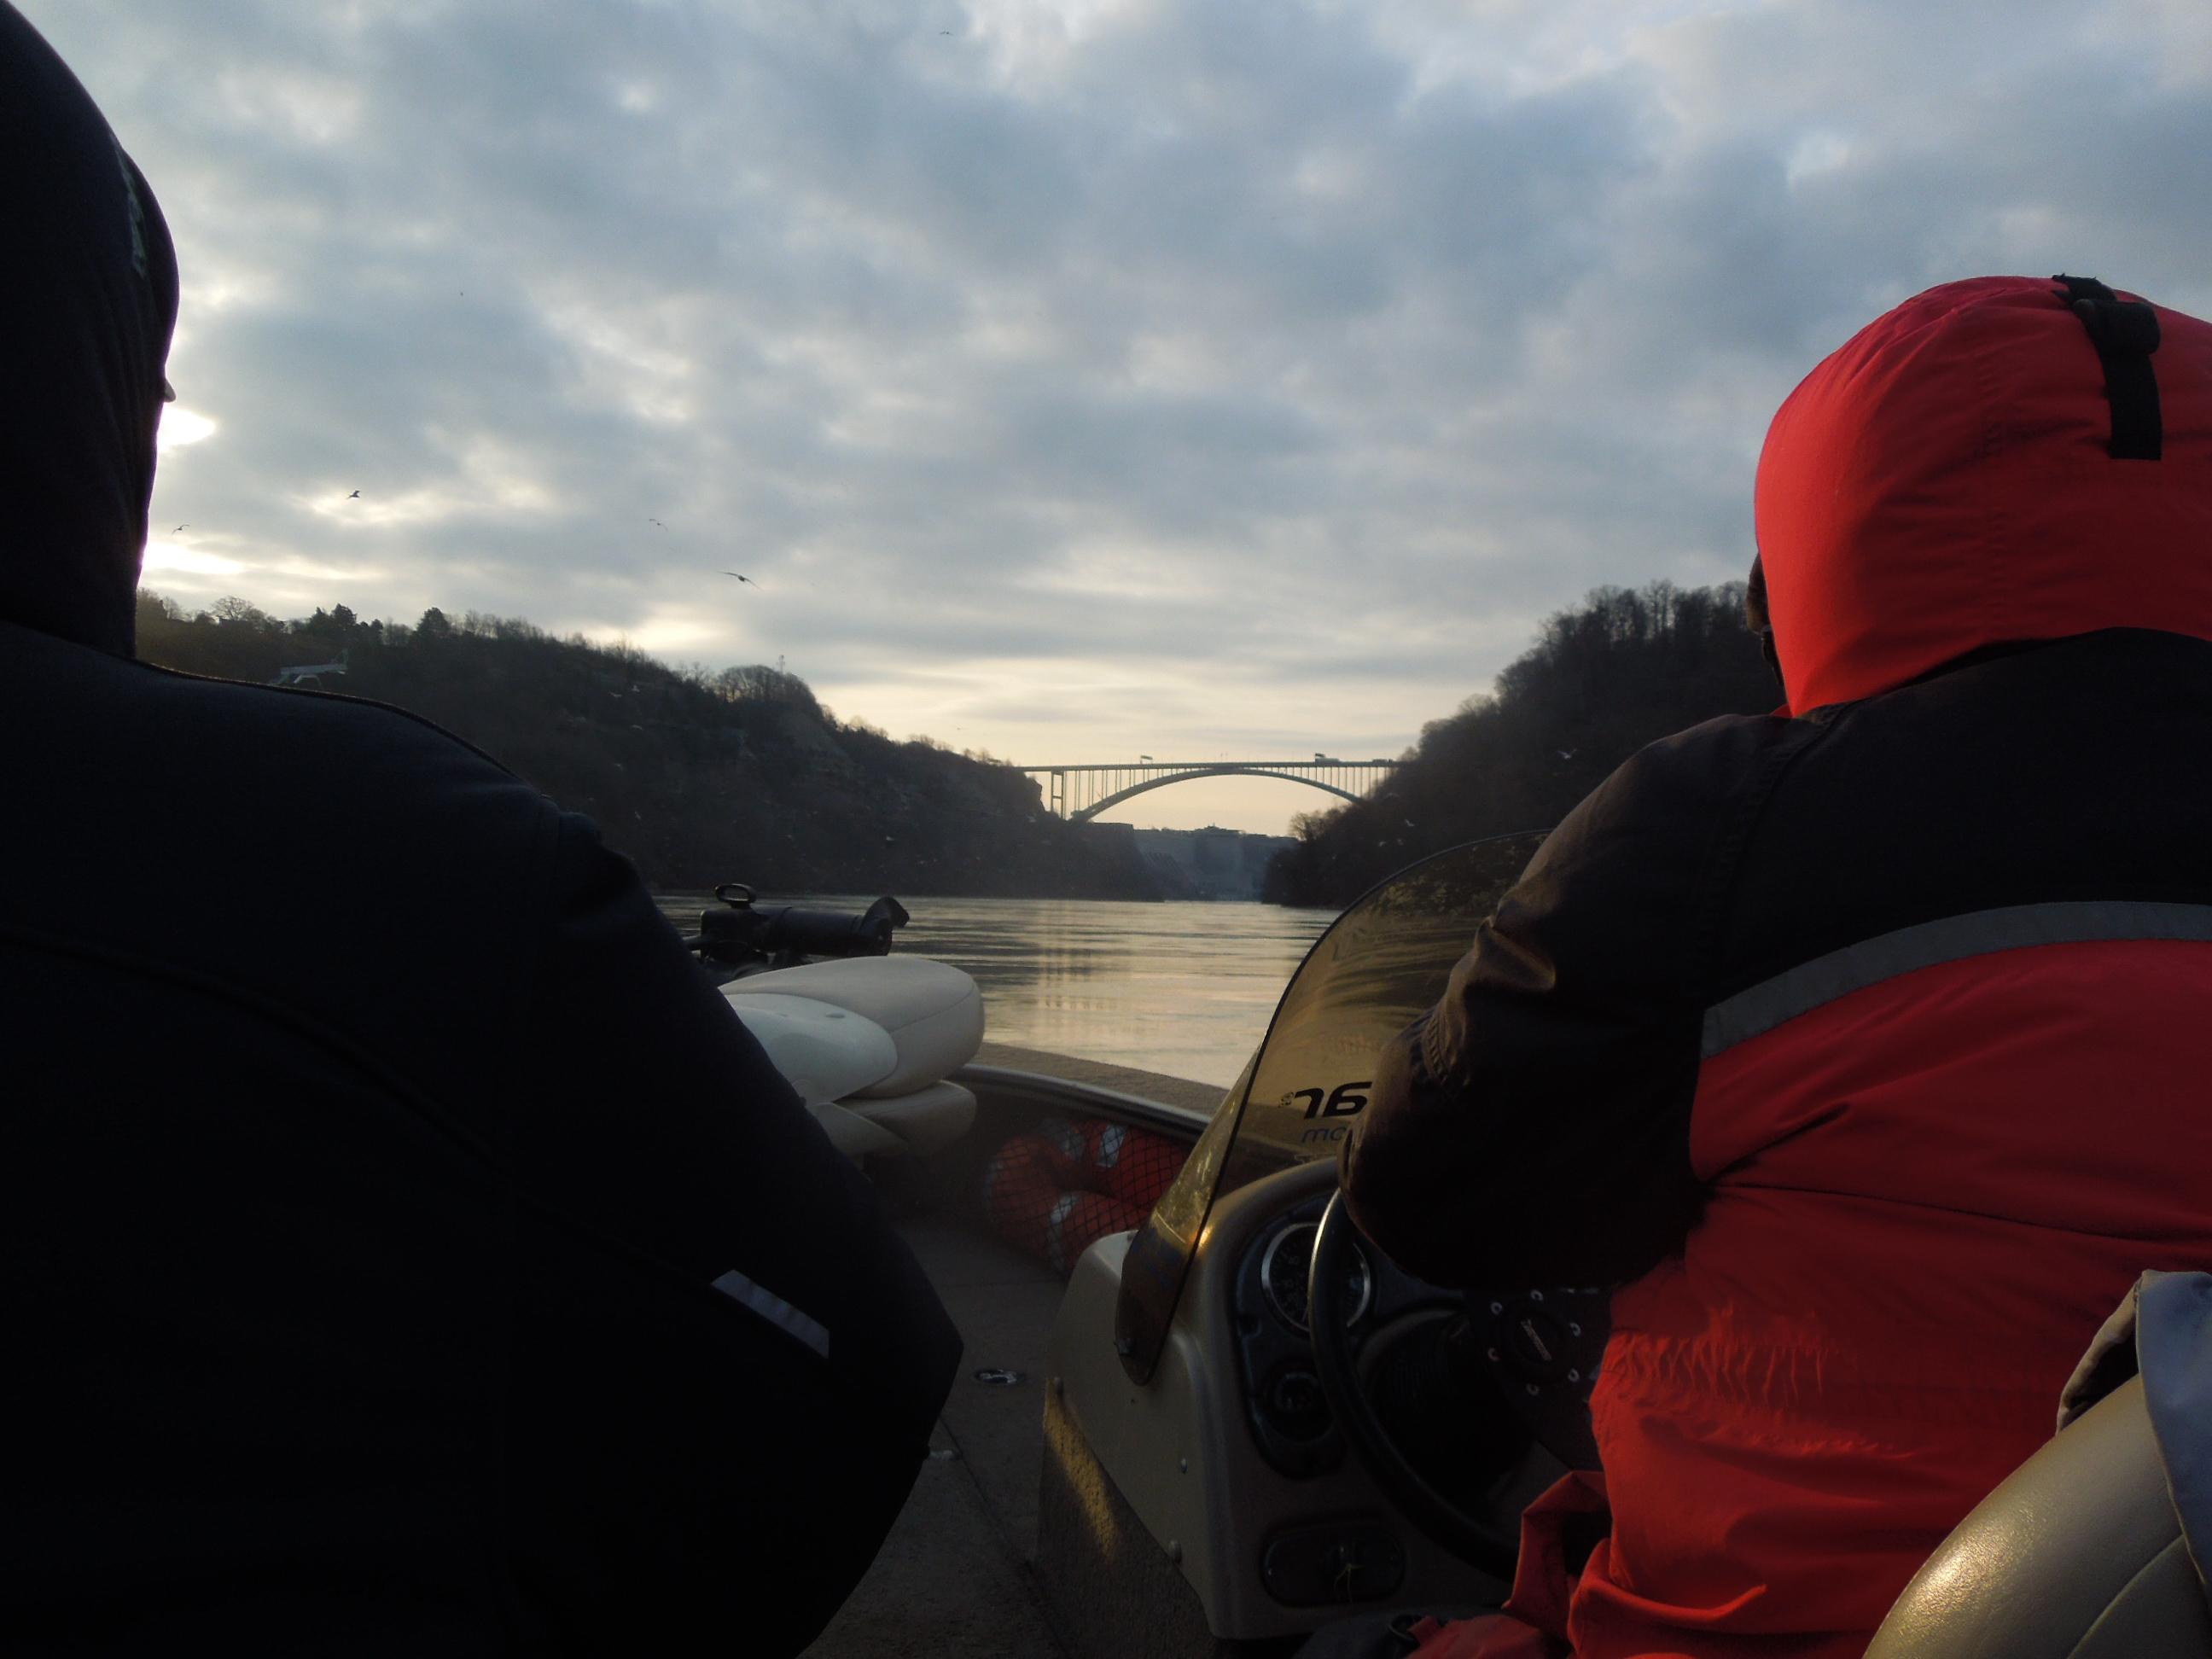 Niagara River Salmon-Snagger Lawbreakers are Caught